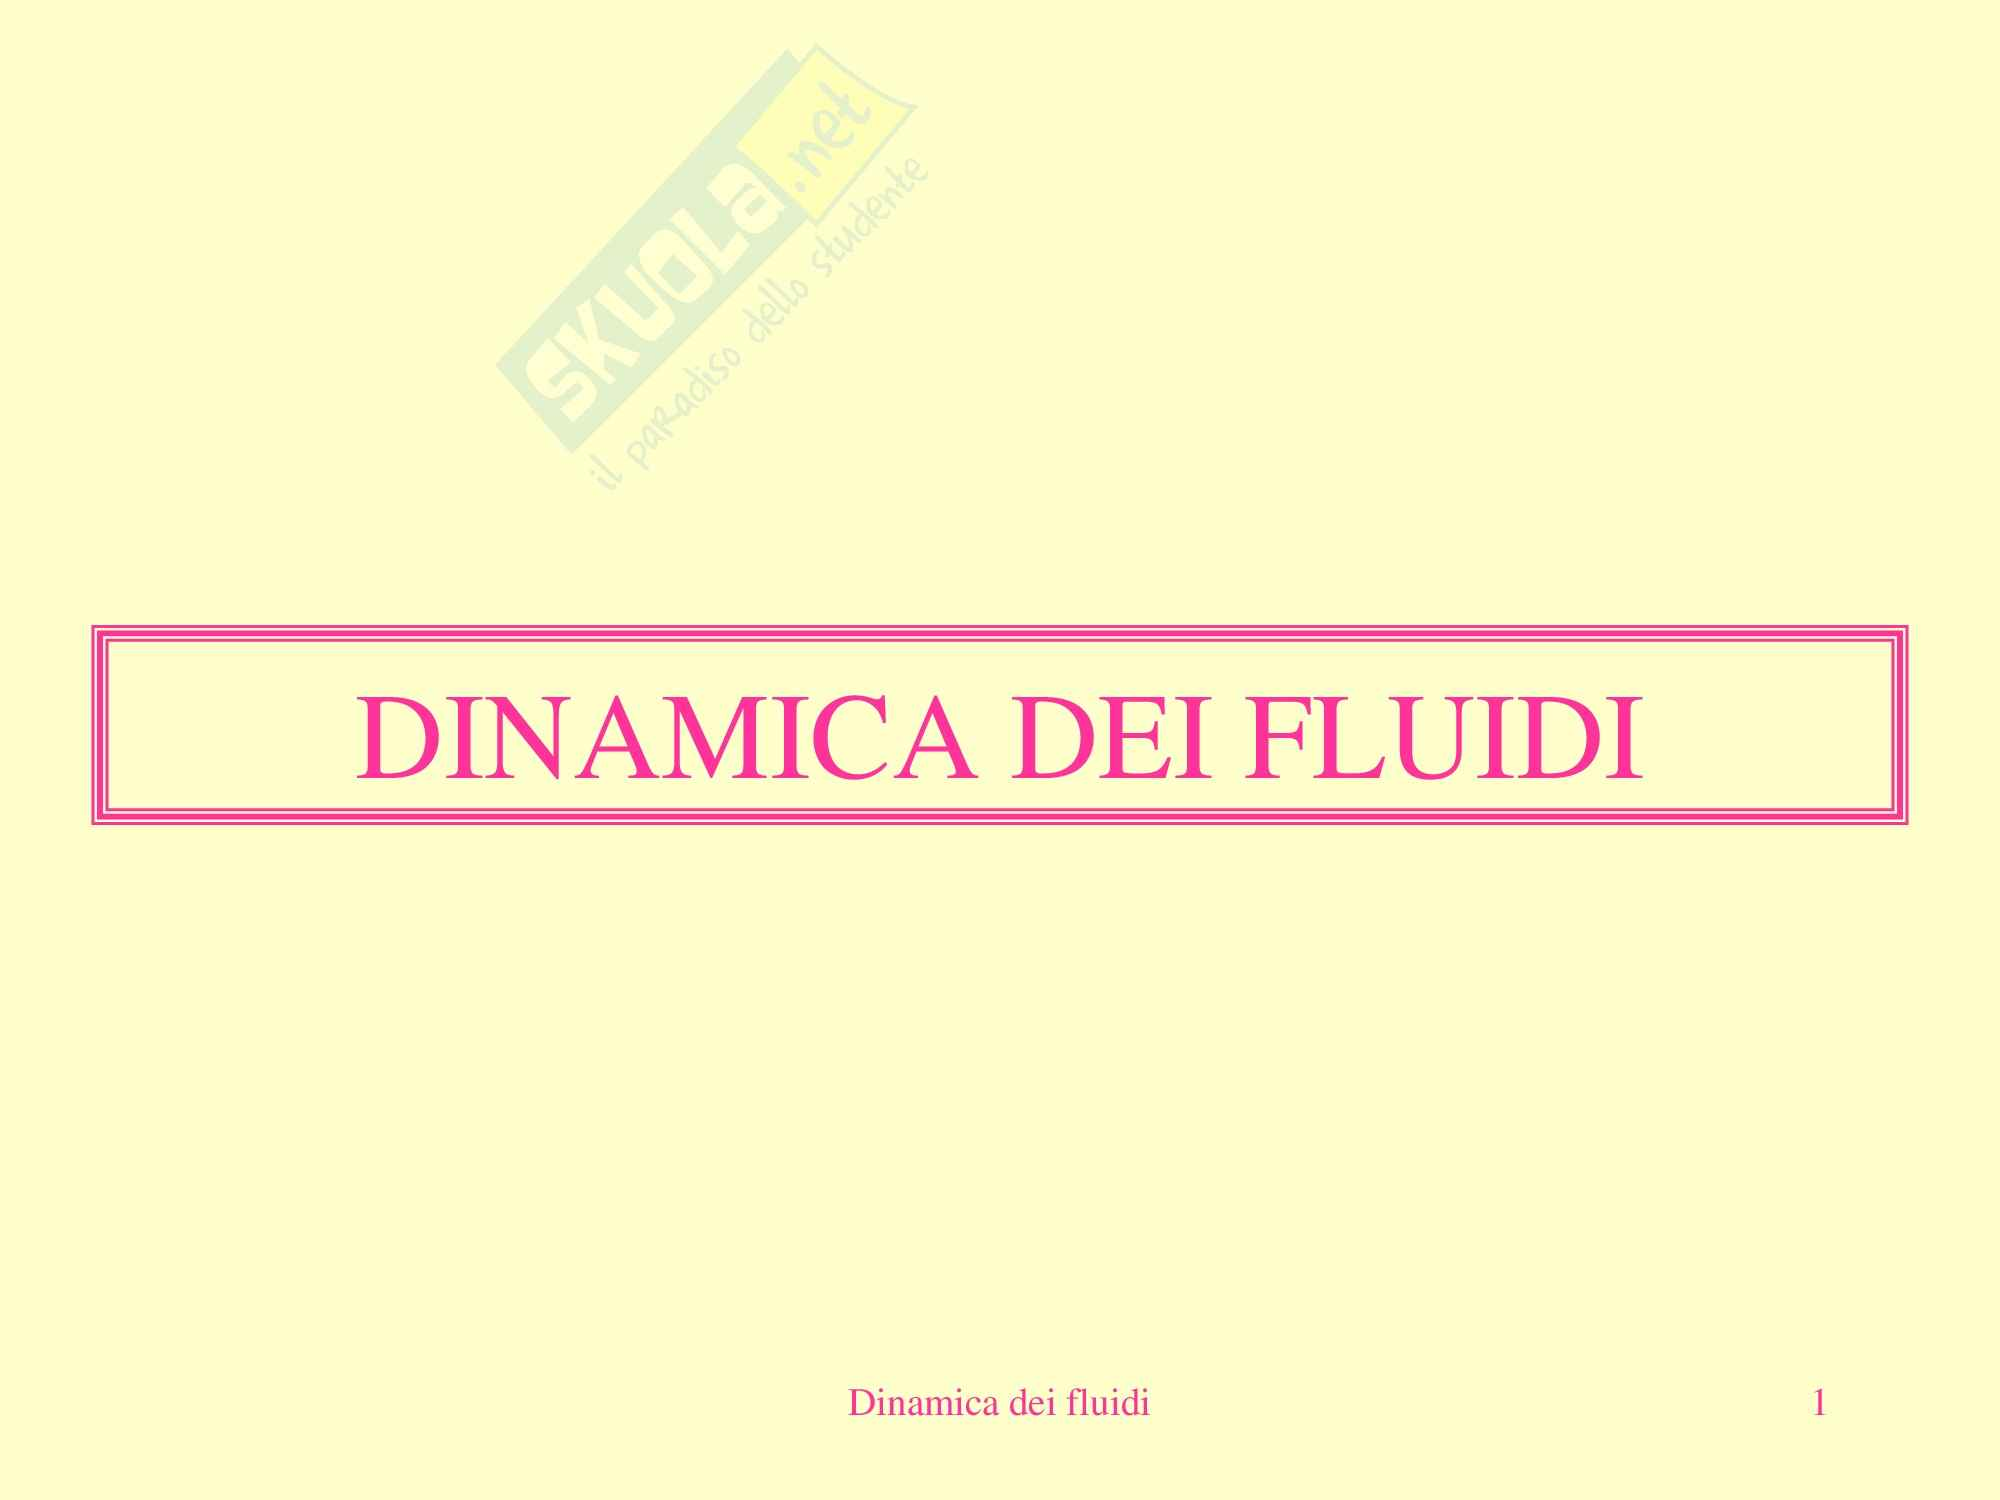 Fisica medica - dinamica dei fluidi